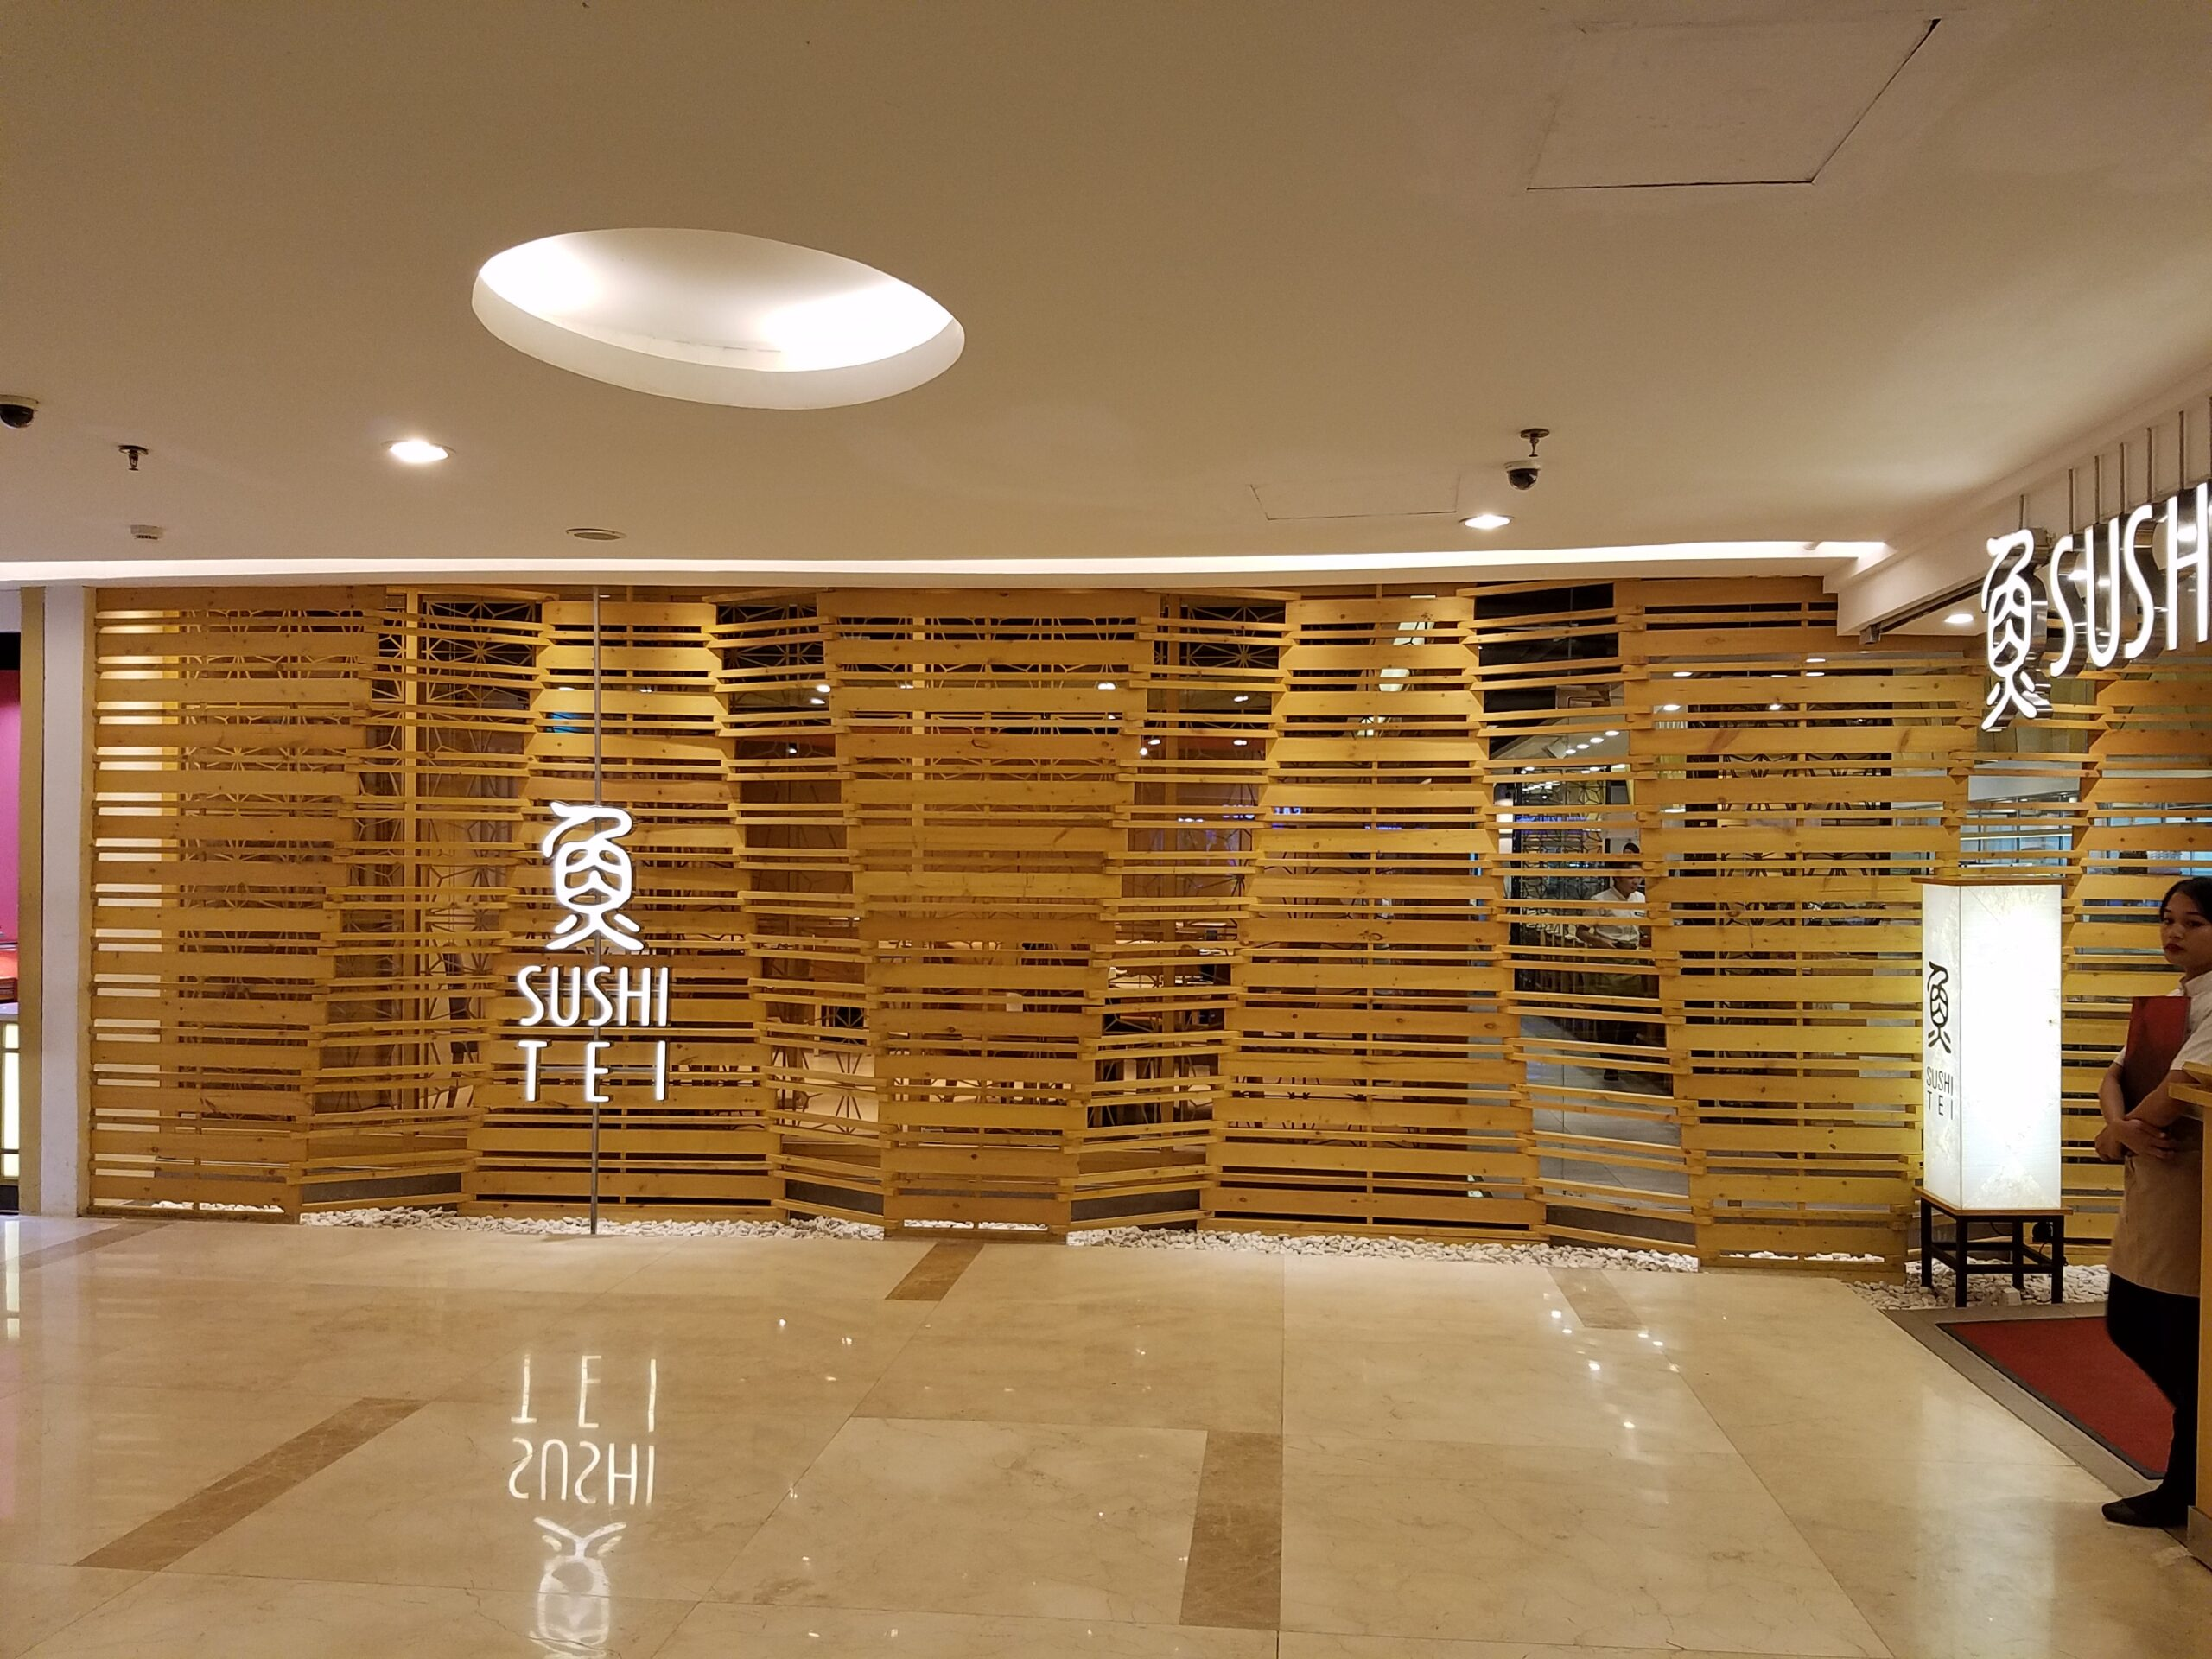 Sushi Tei Lippo Plaza